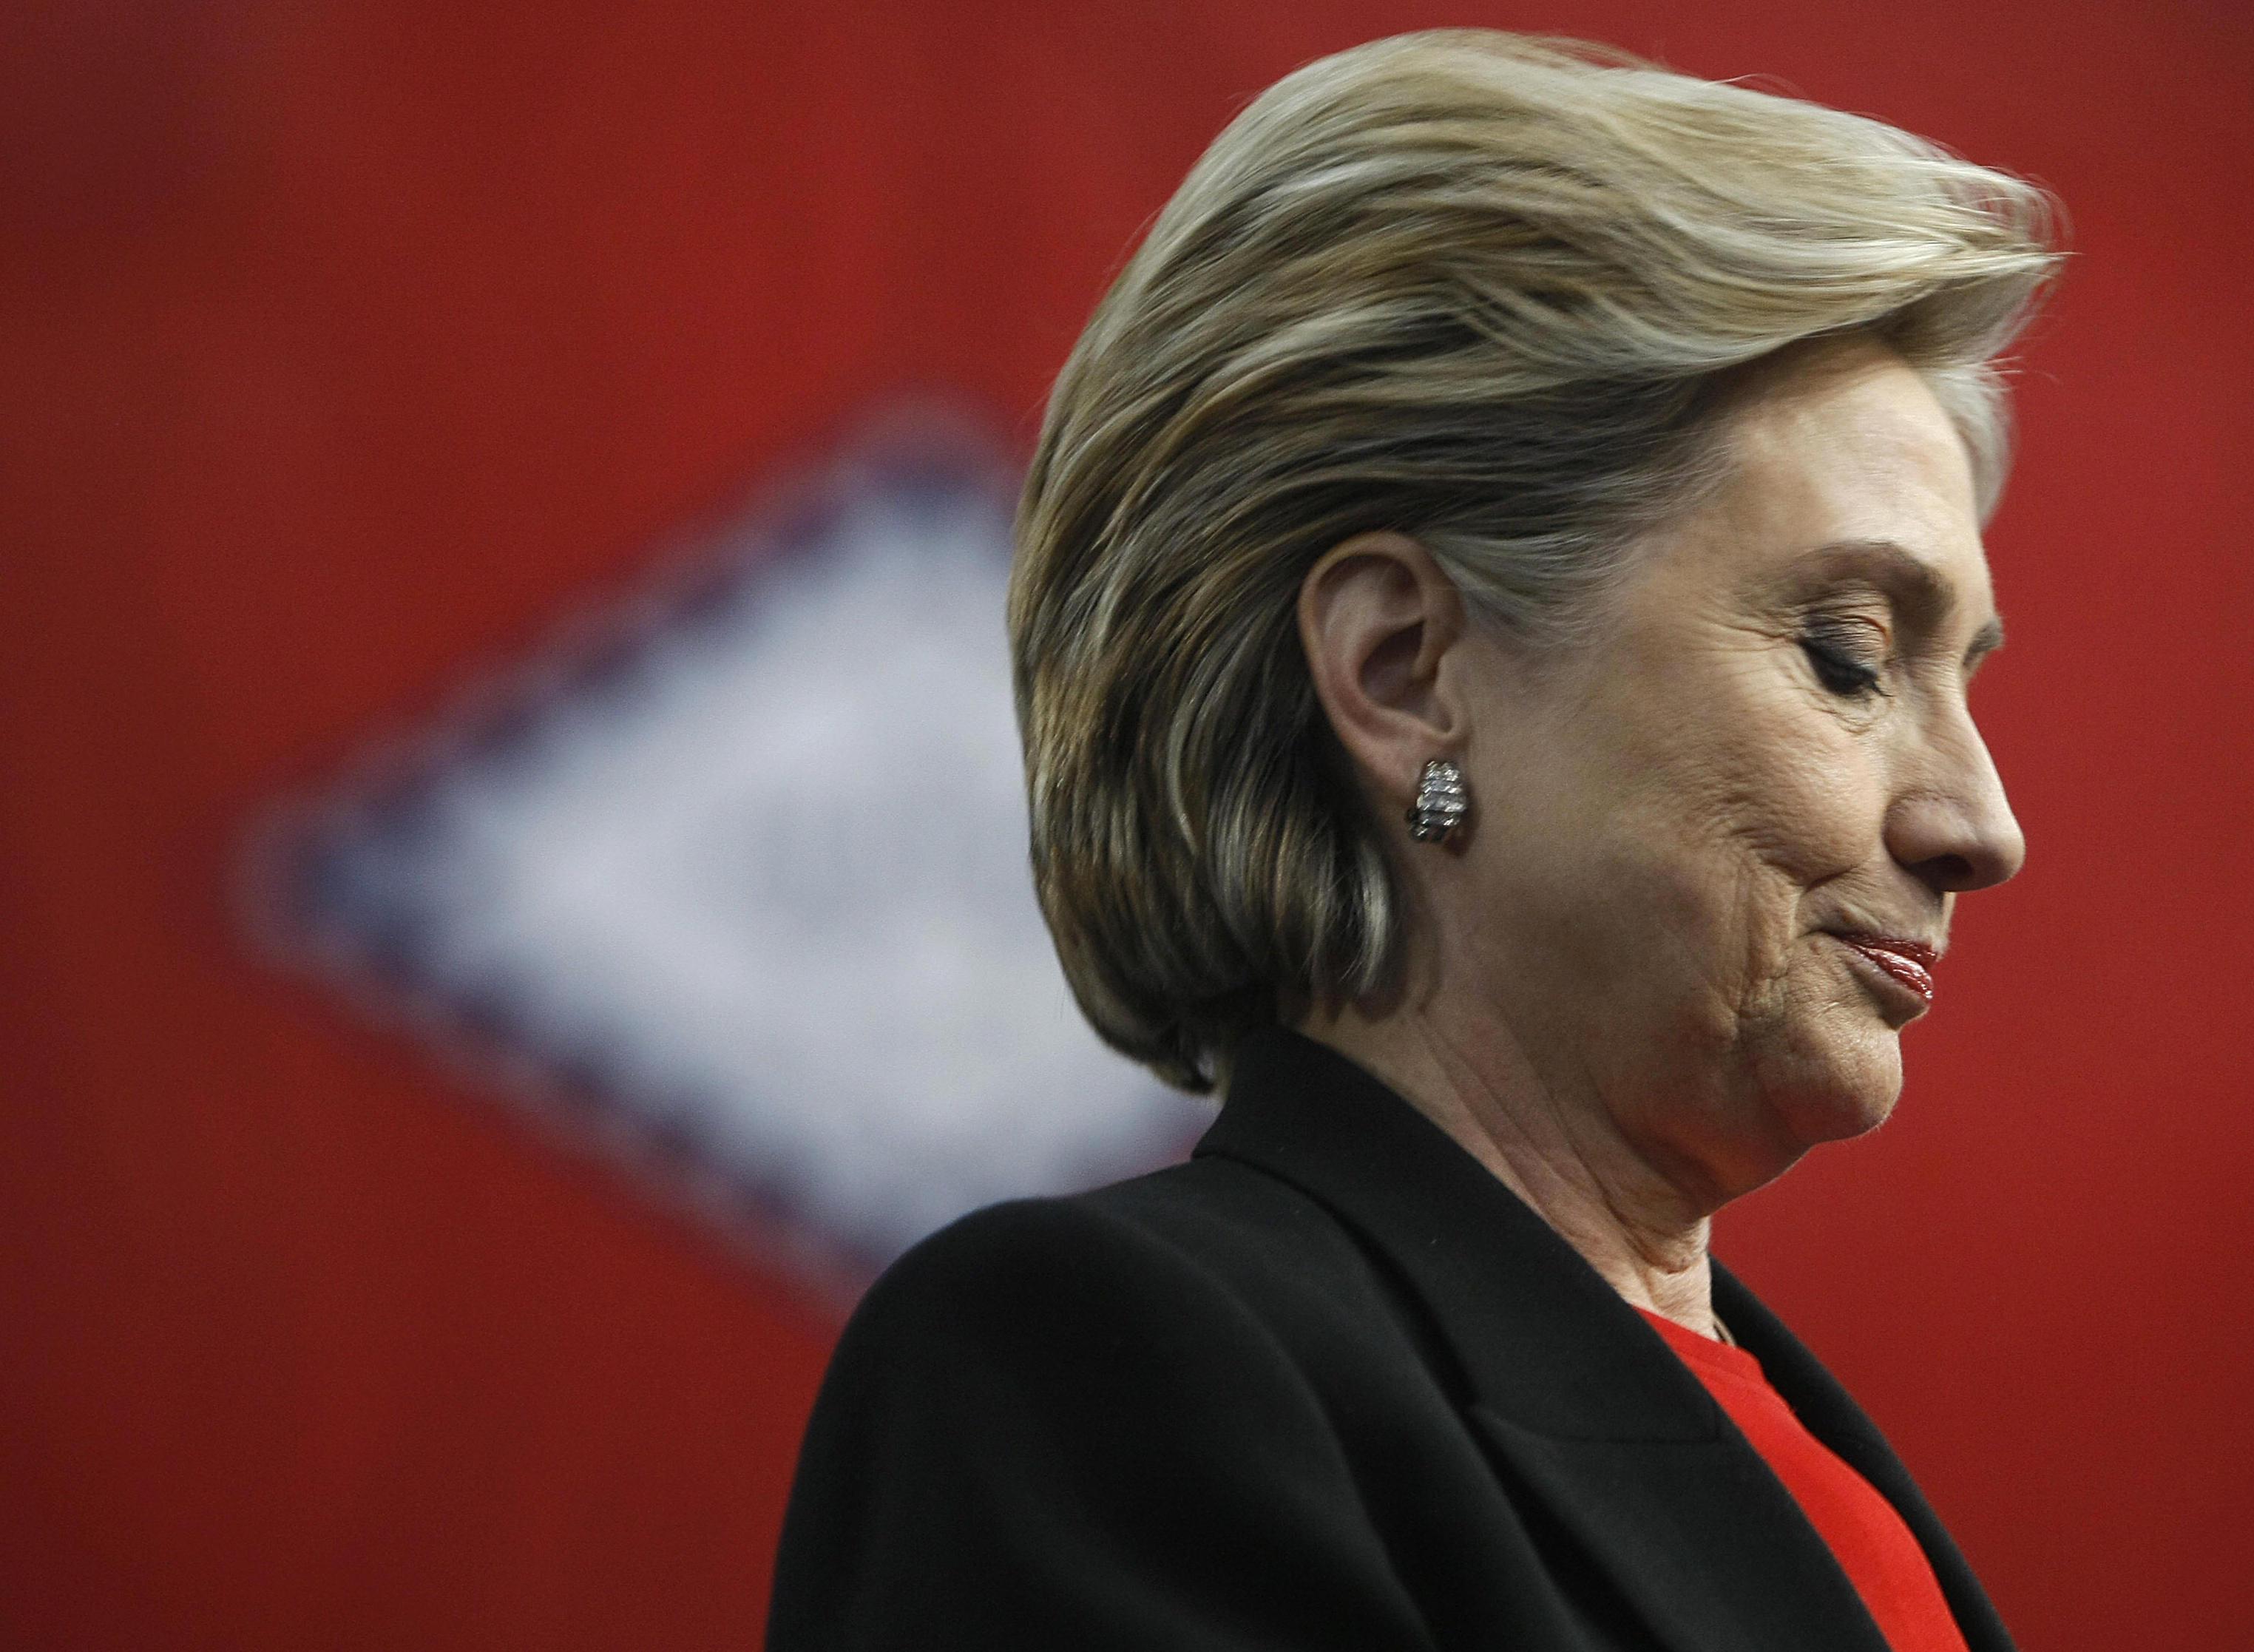 Kathy Shelton Hillary Clinton, Clinton defends rapist, 12 year old rape victim, Clinton scandals, Hillary Clinton laughed